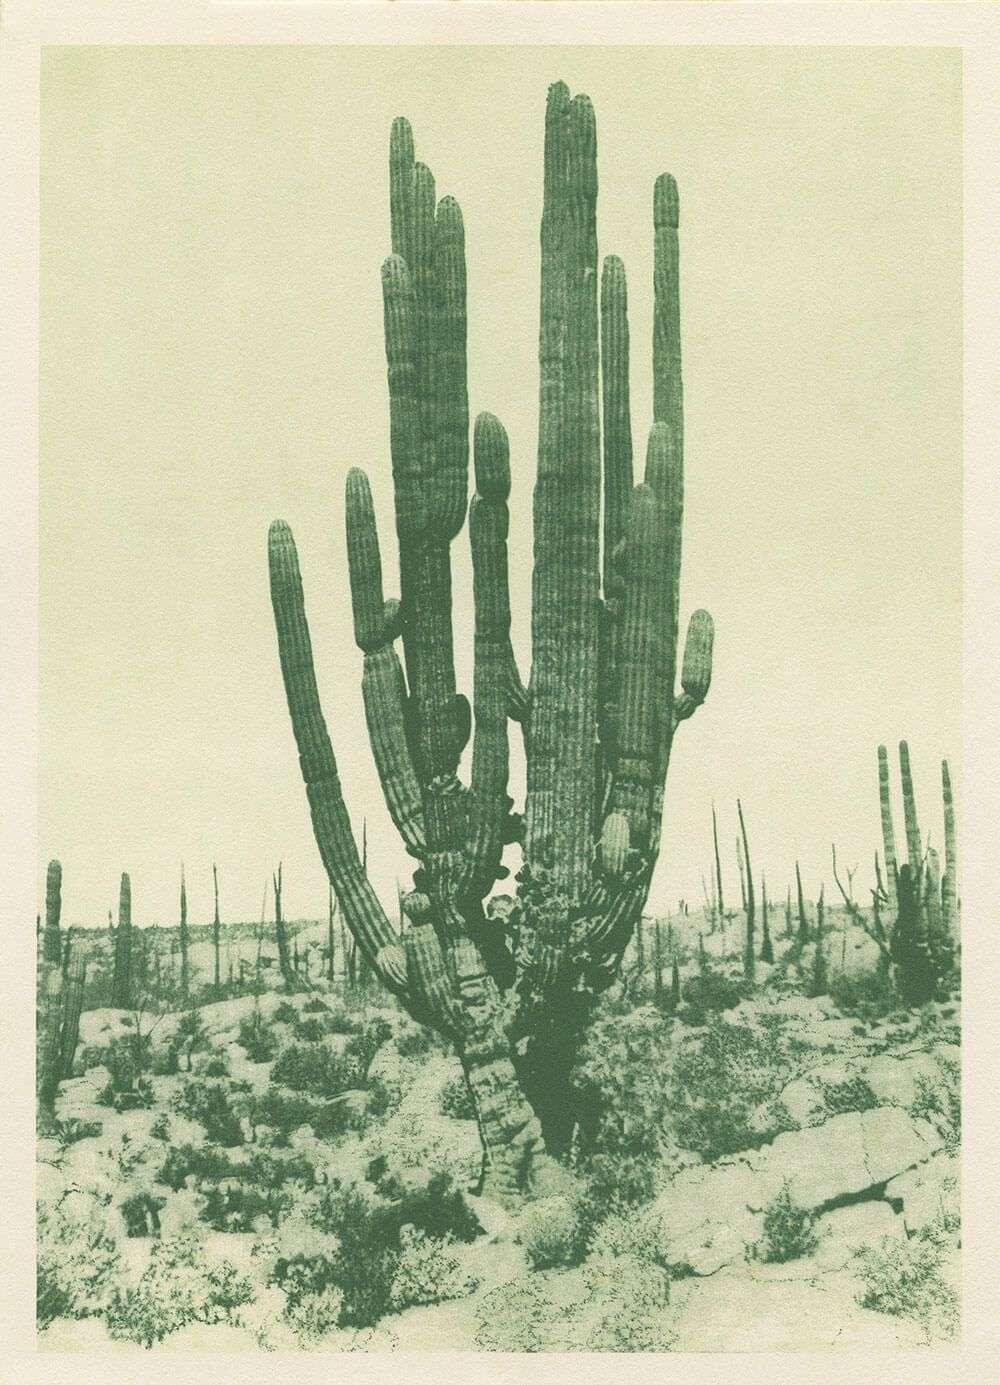 Antique Cactus Print 3 Colors Capricorn Press